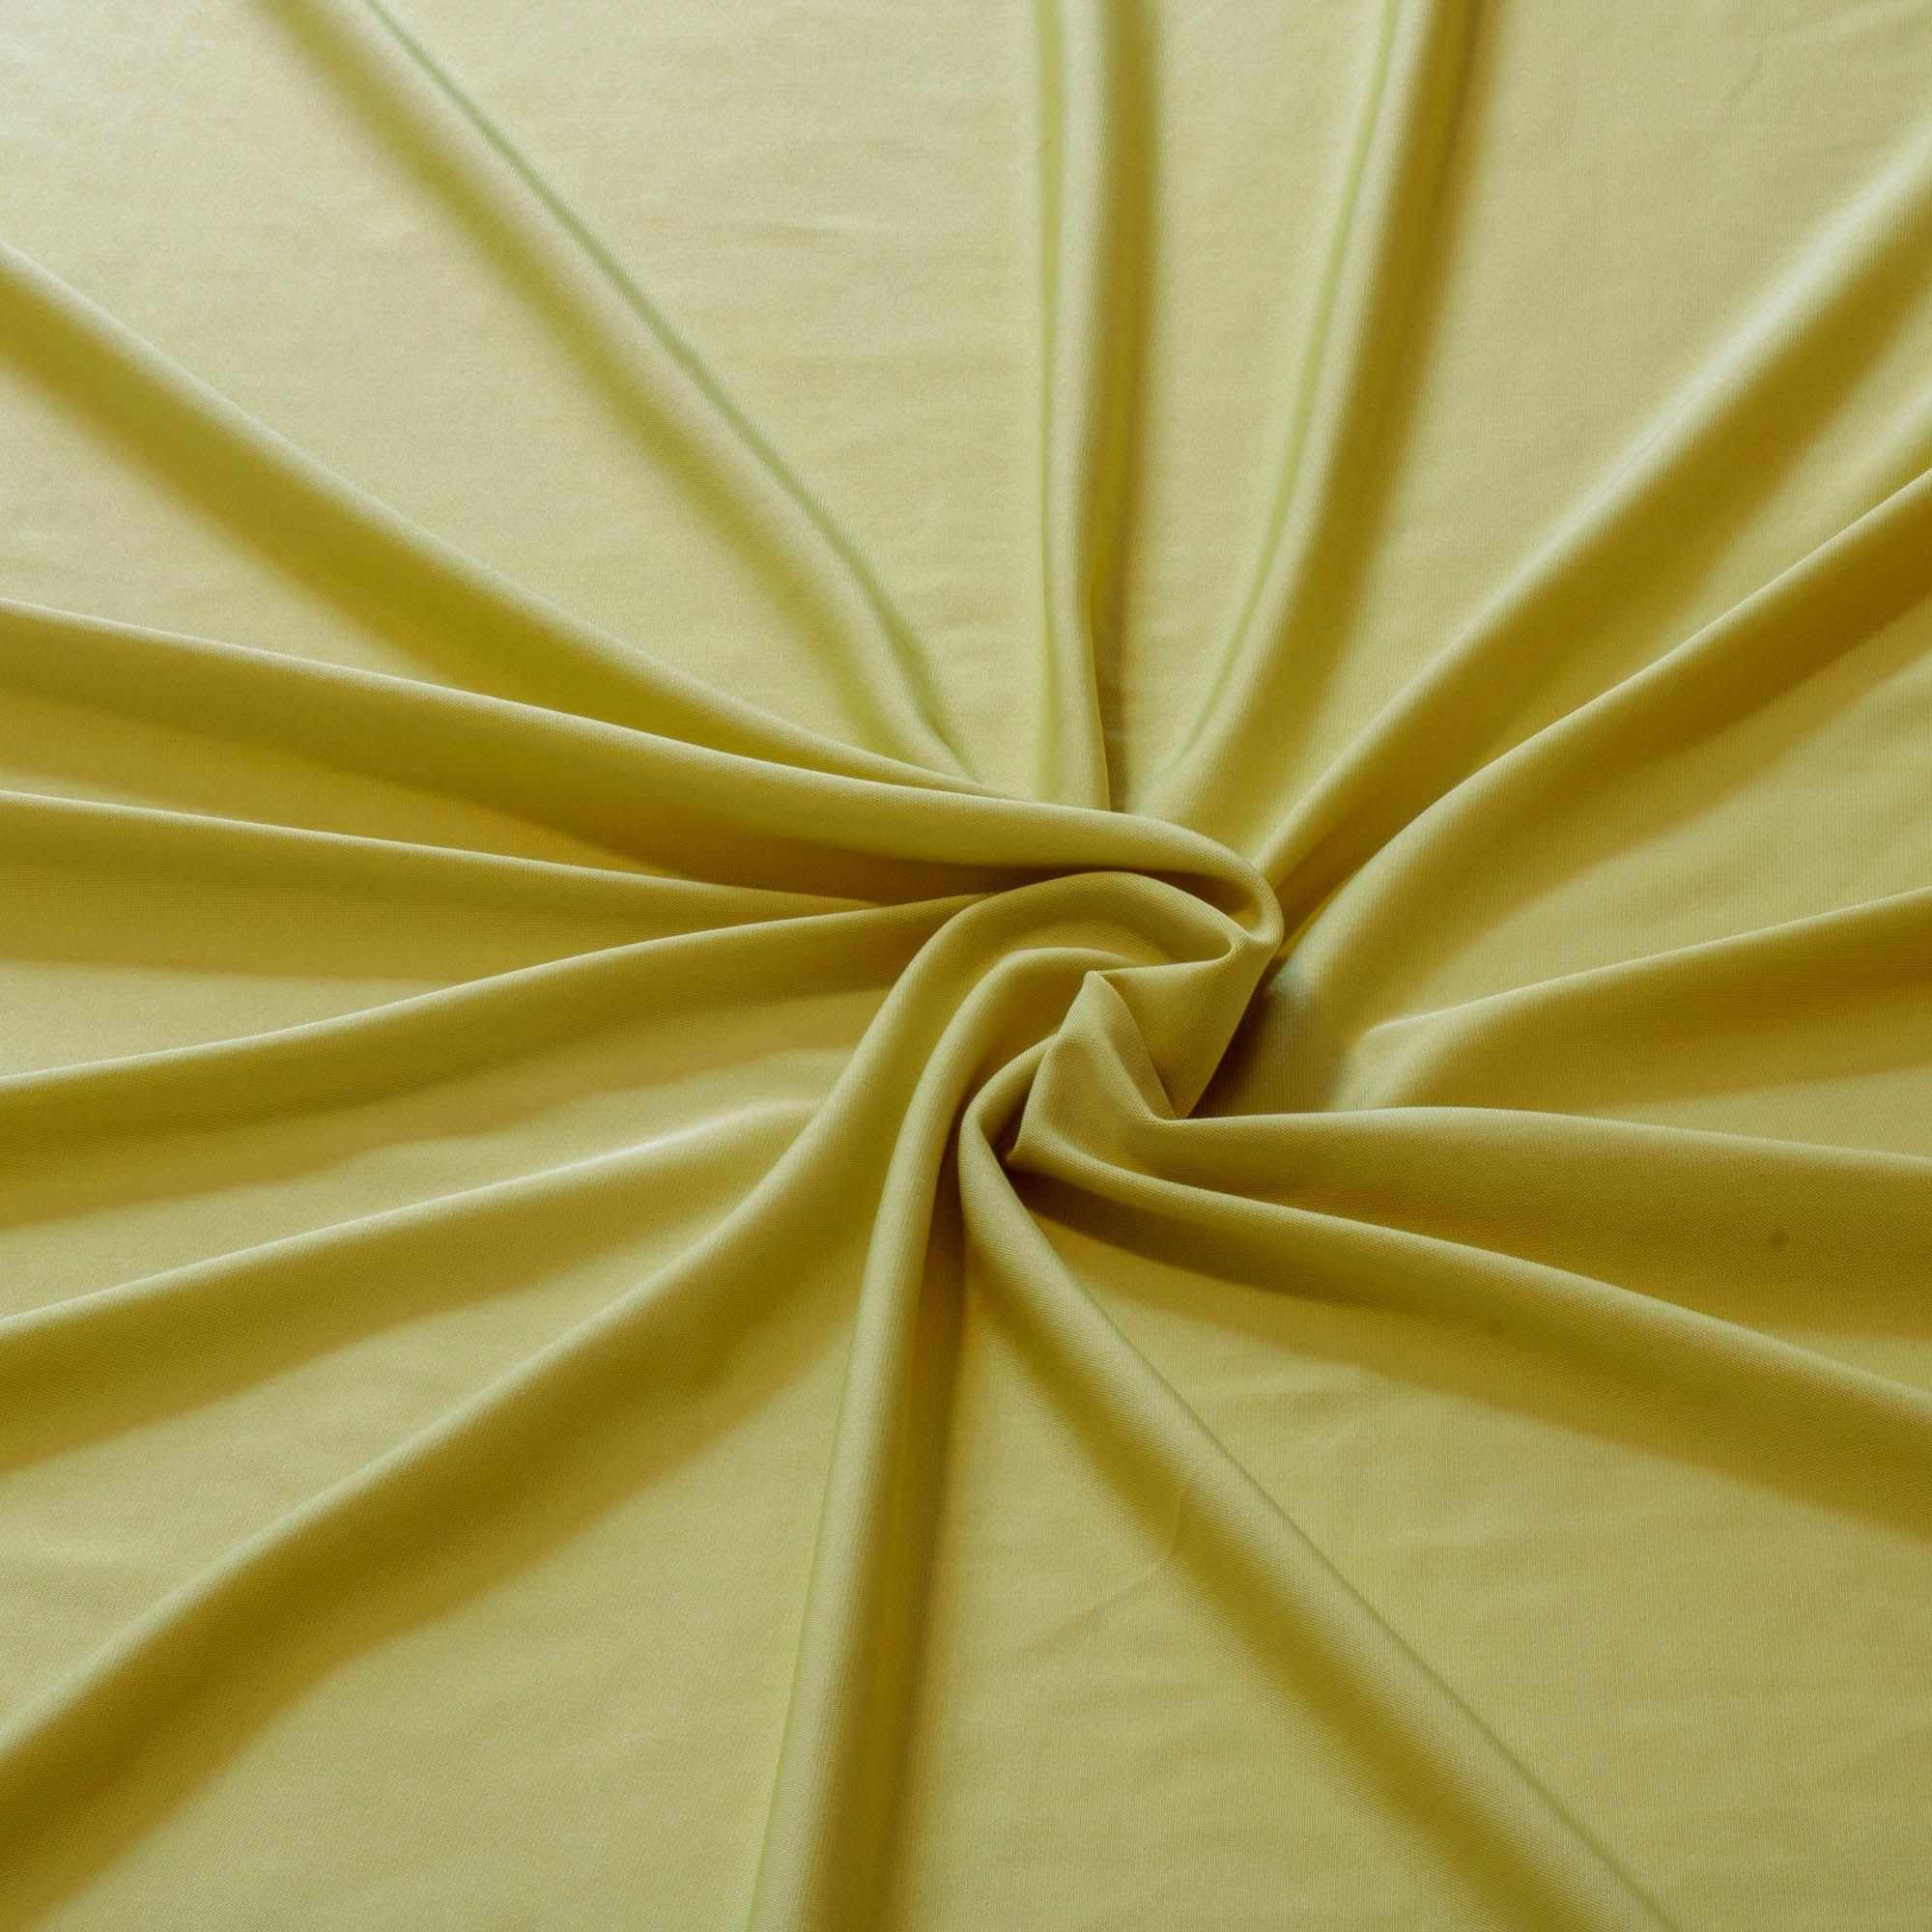 Tecido Malha Liganete Verde Neon 96% Poliester 4% Elastano 1,50 m Largura